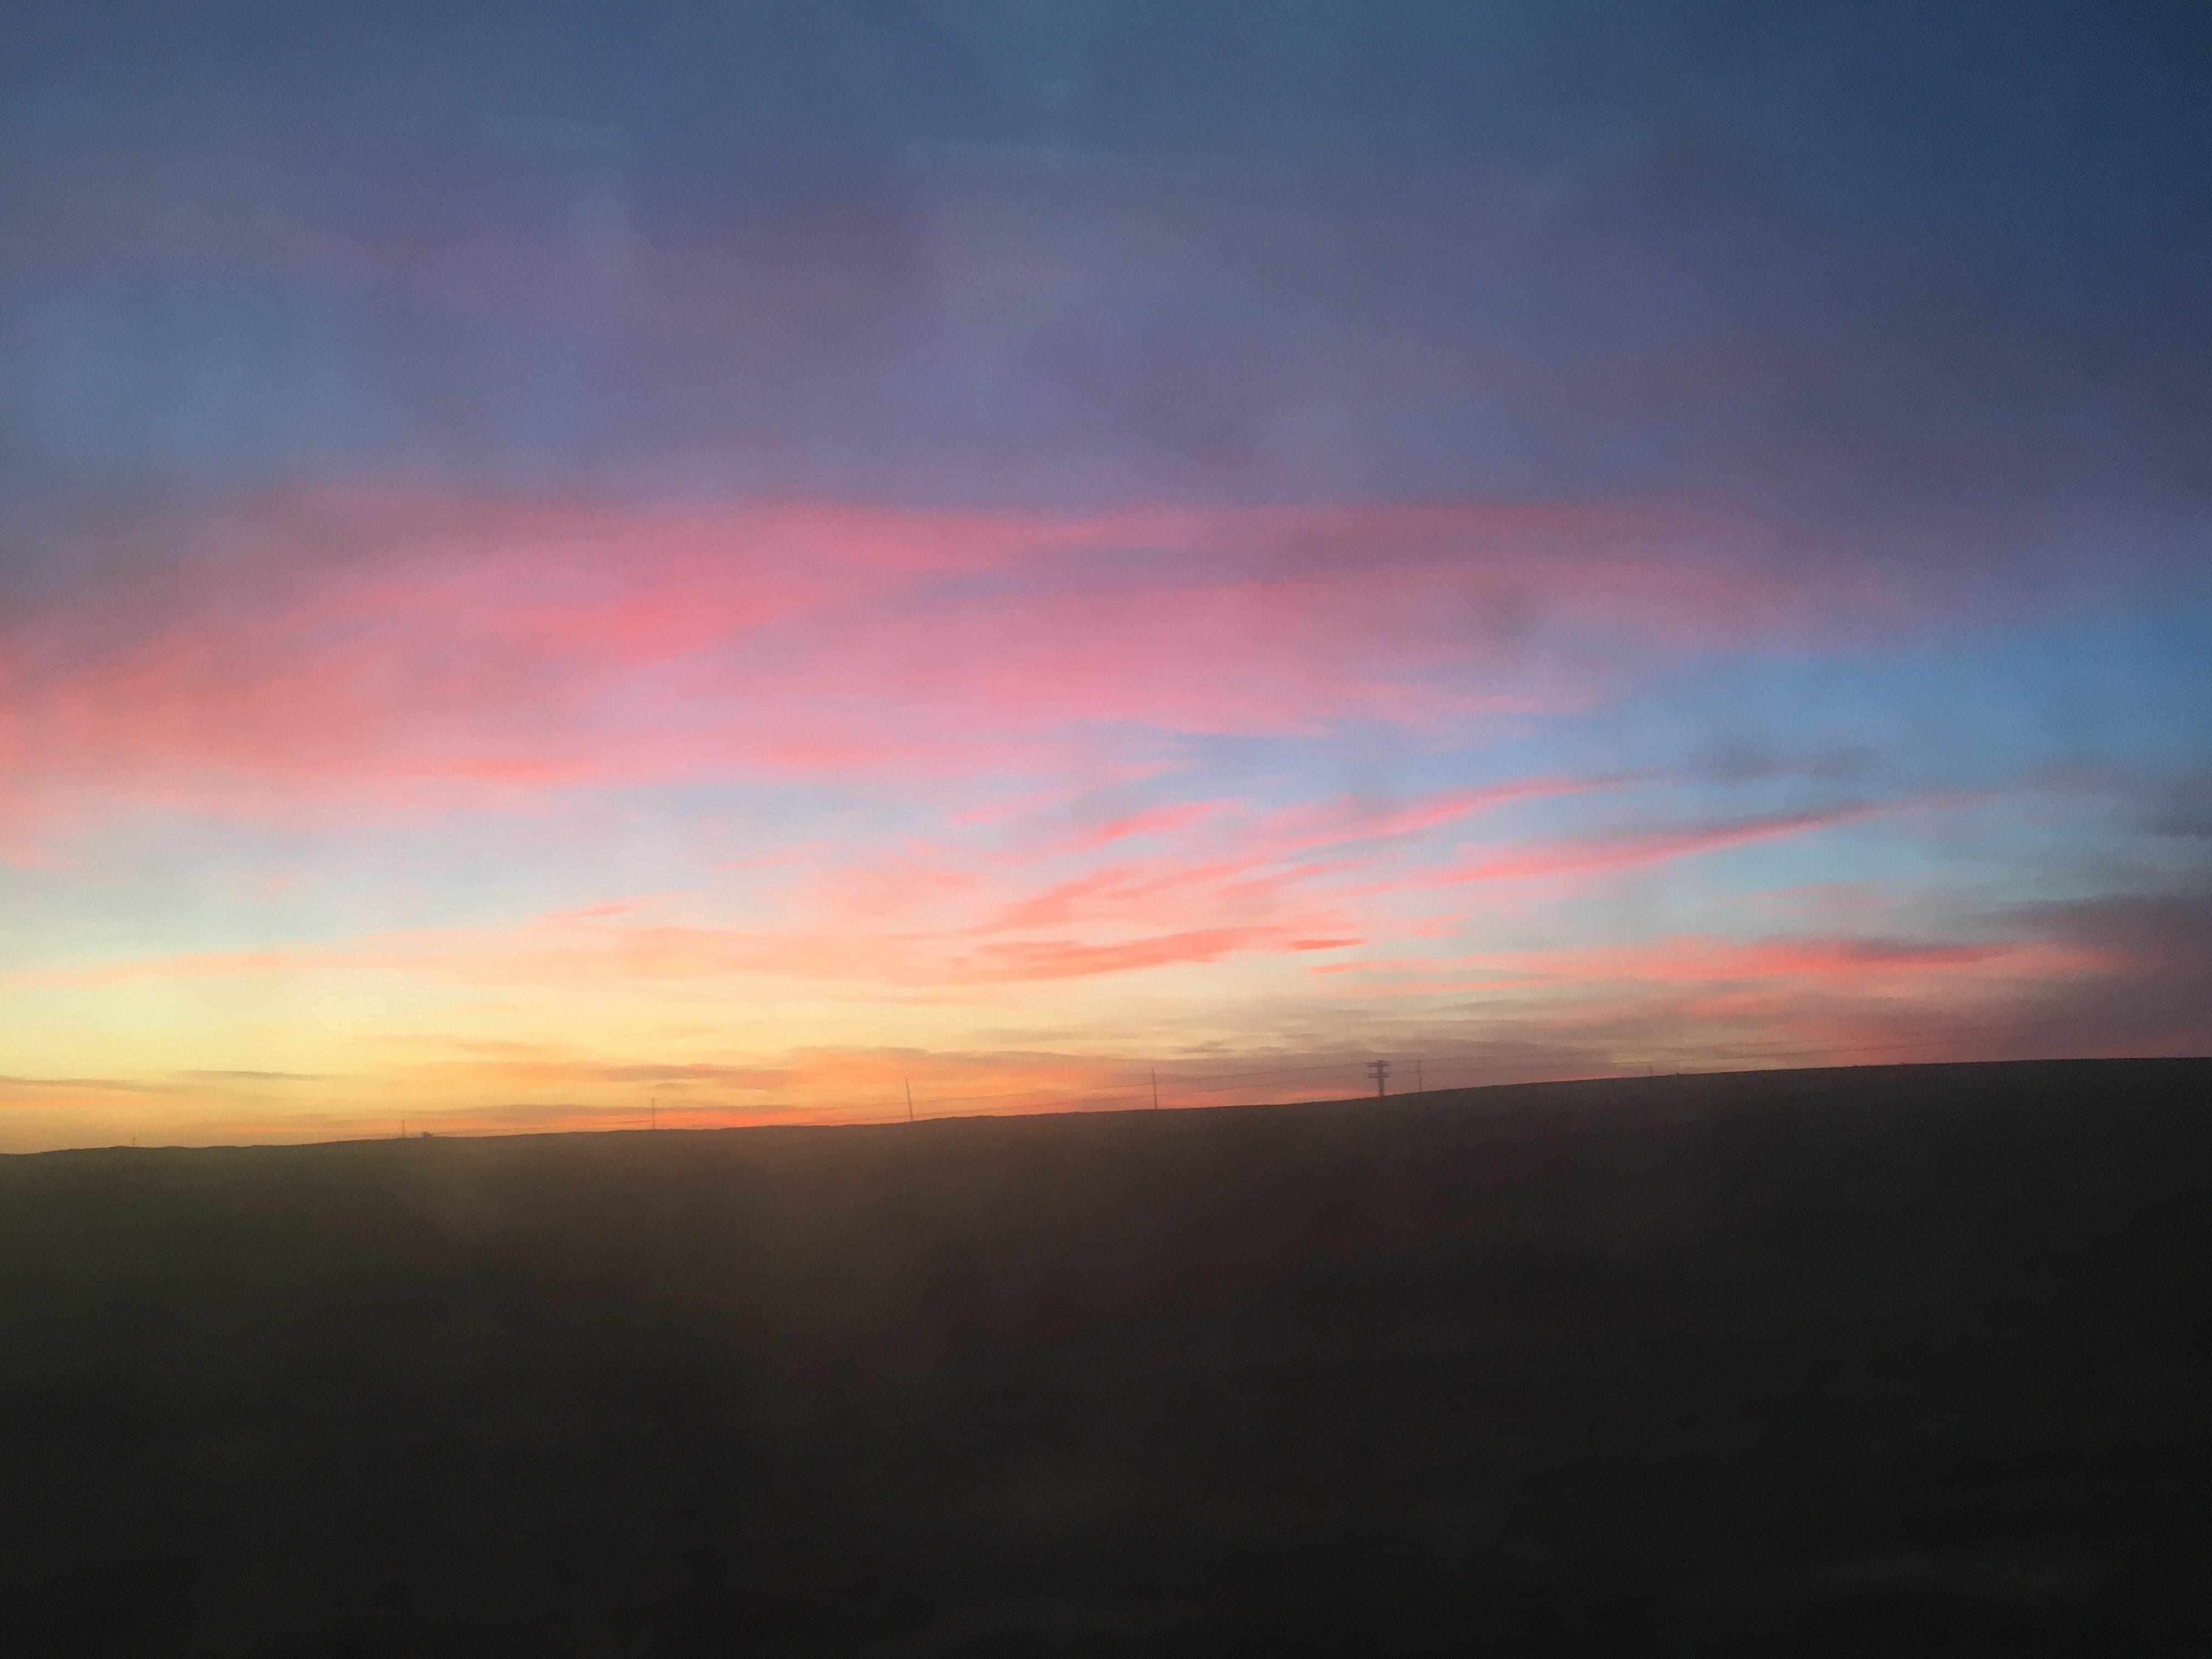 Sunset over Dornogovi - Mongolia